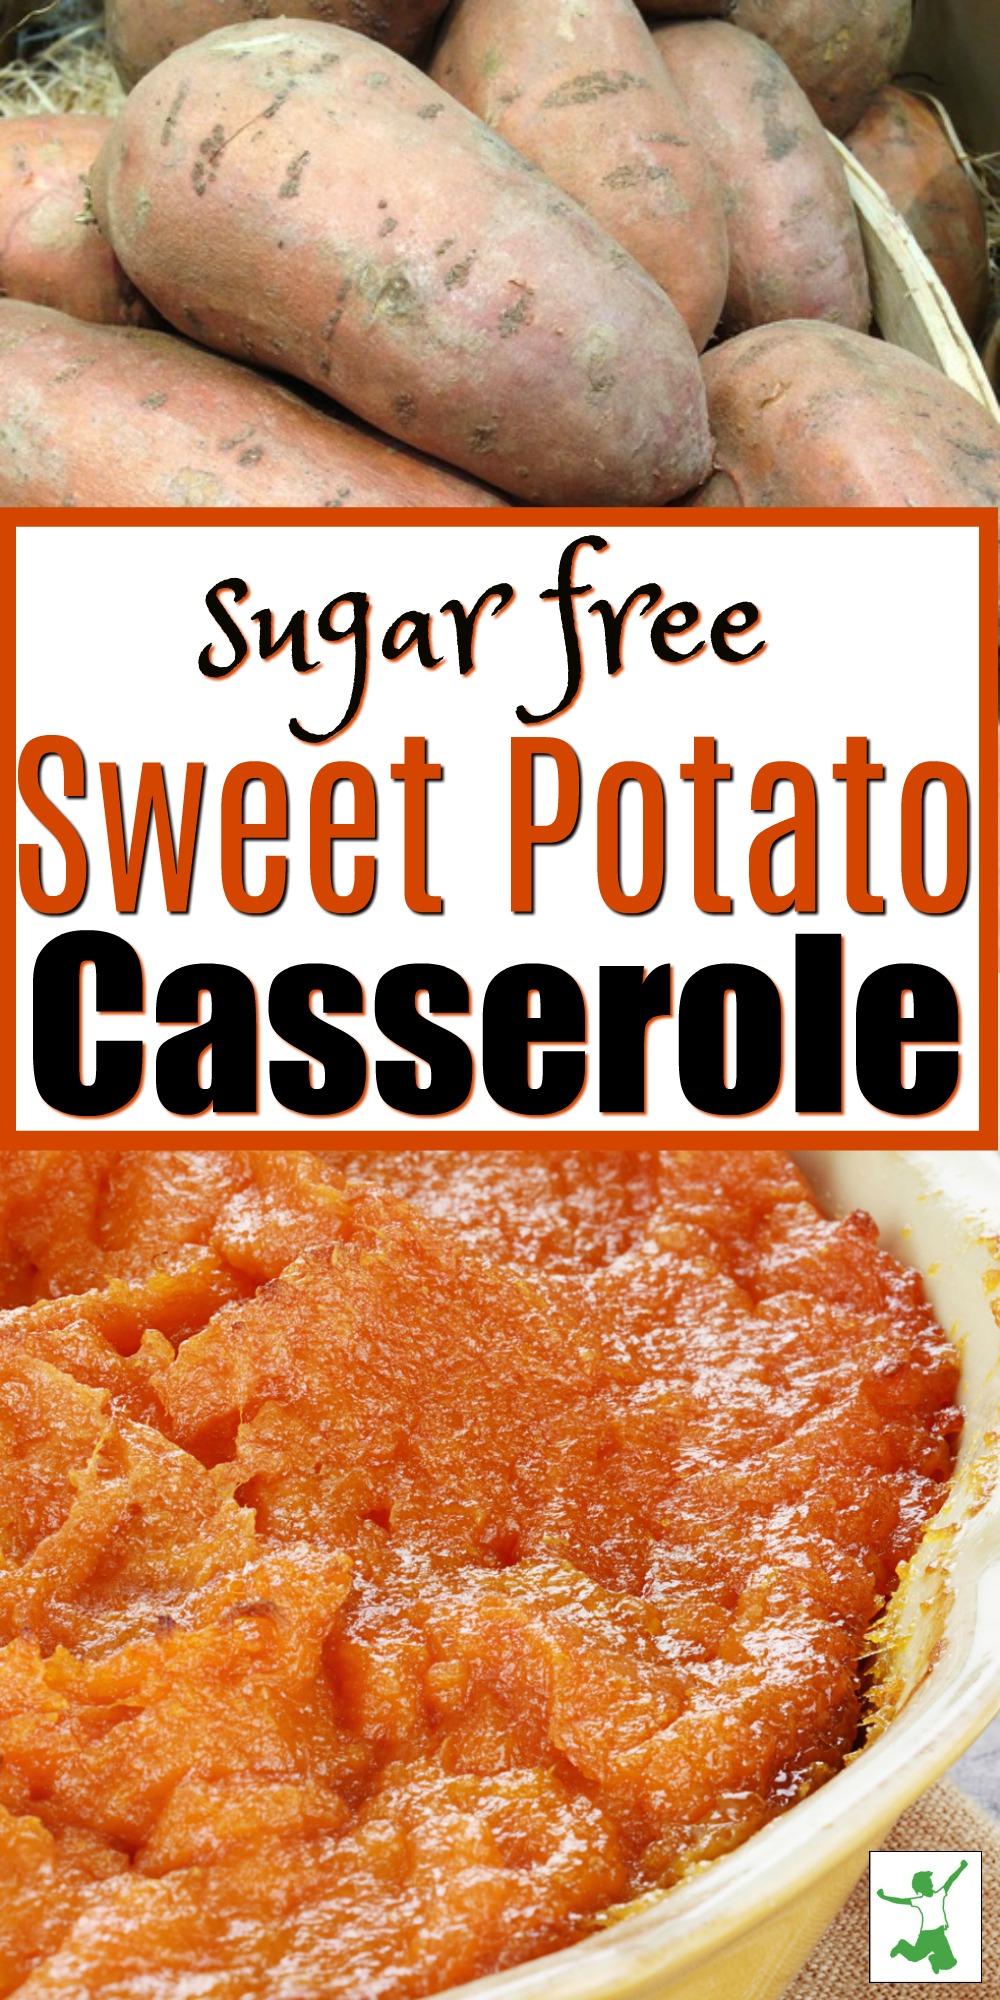 sugar free sweet potato casserole in a dish